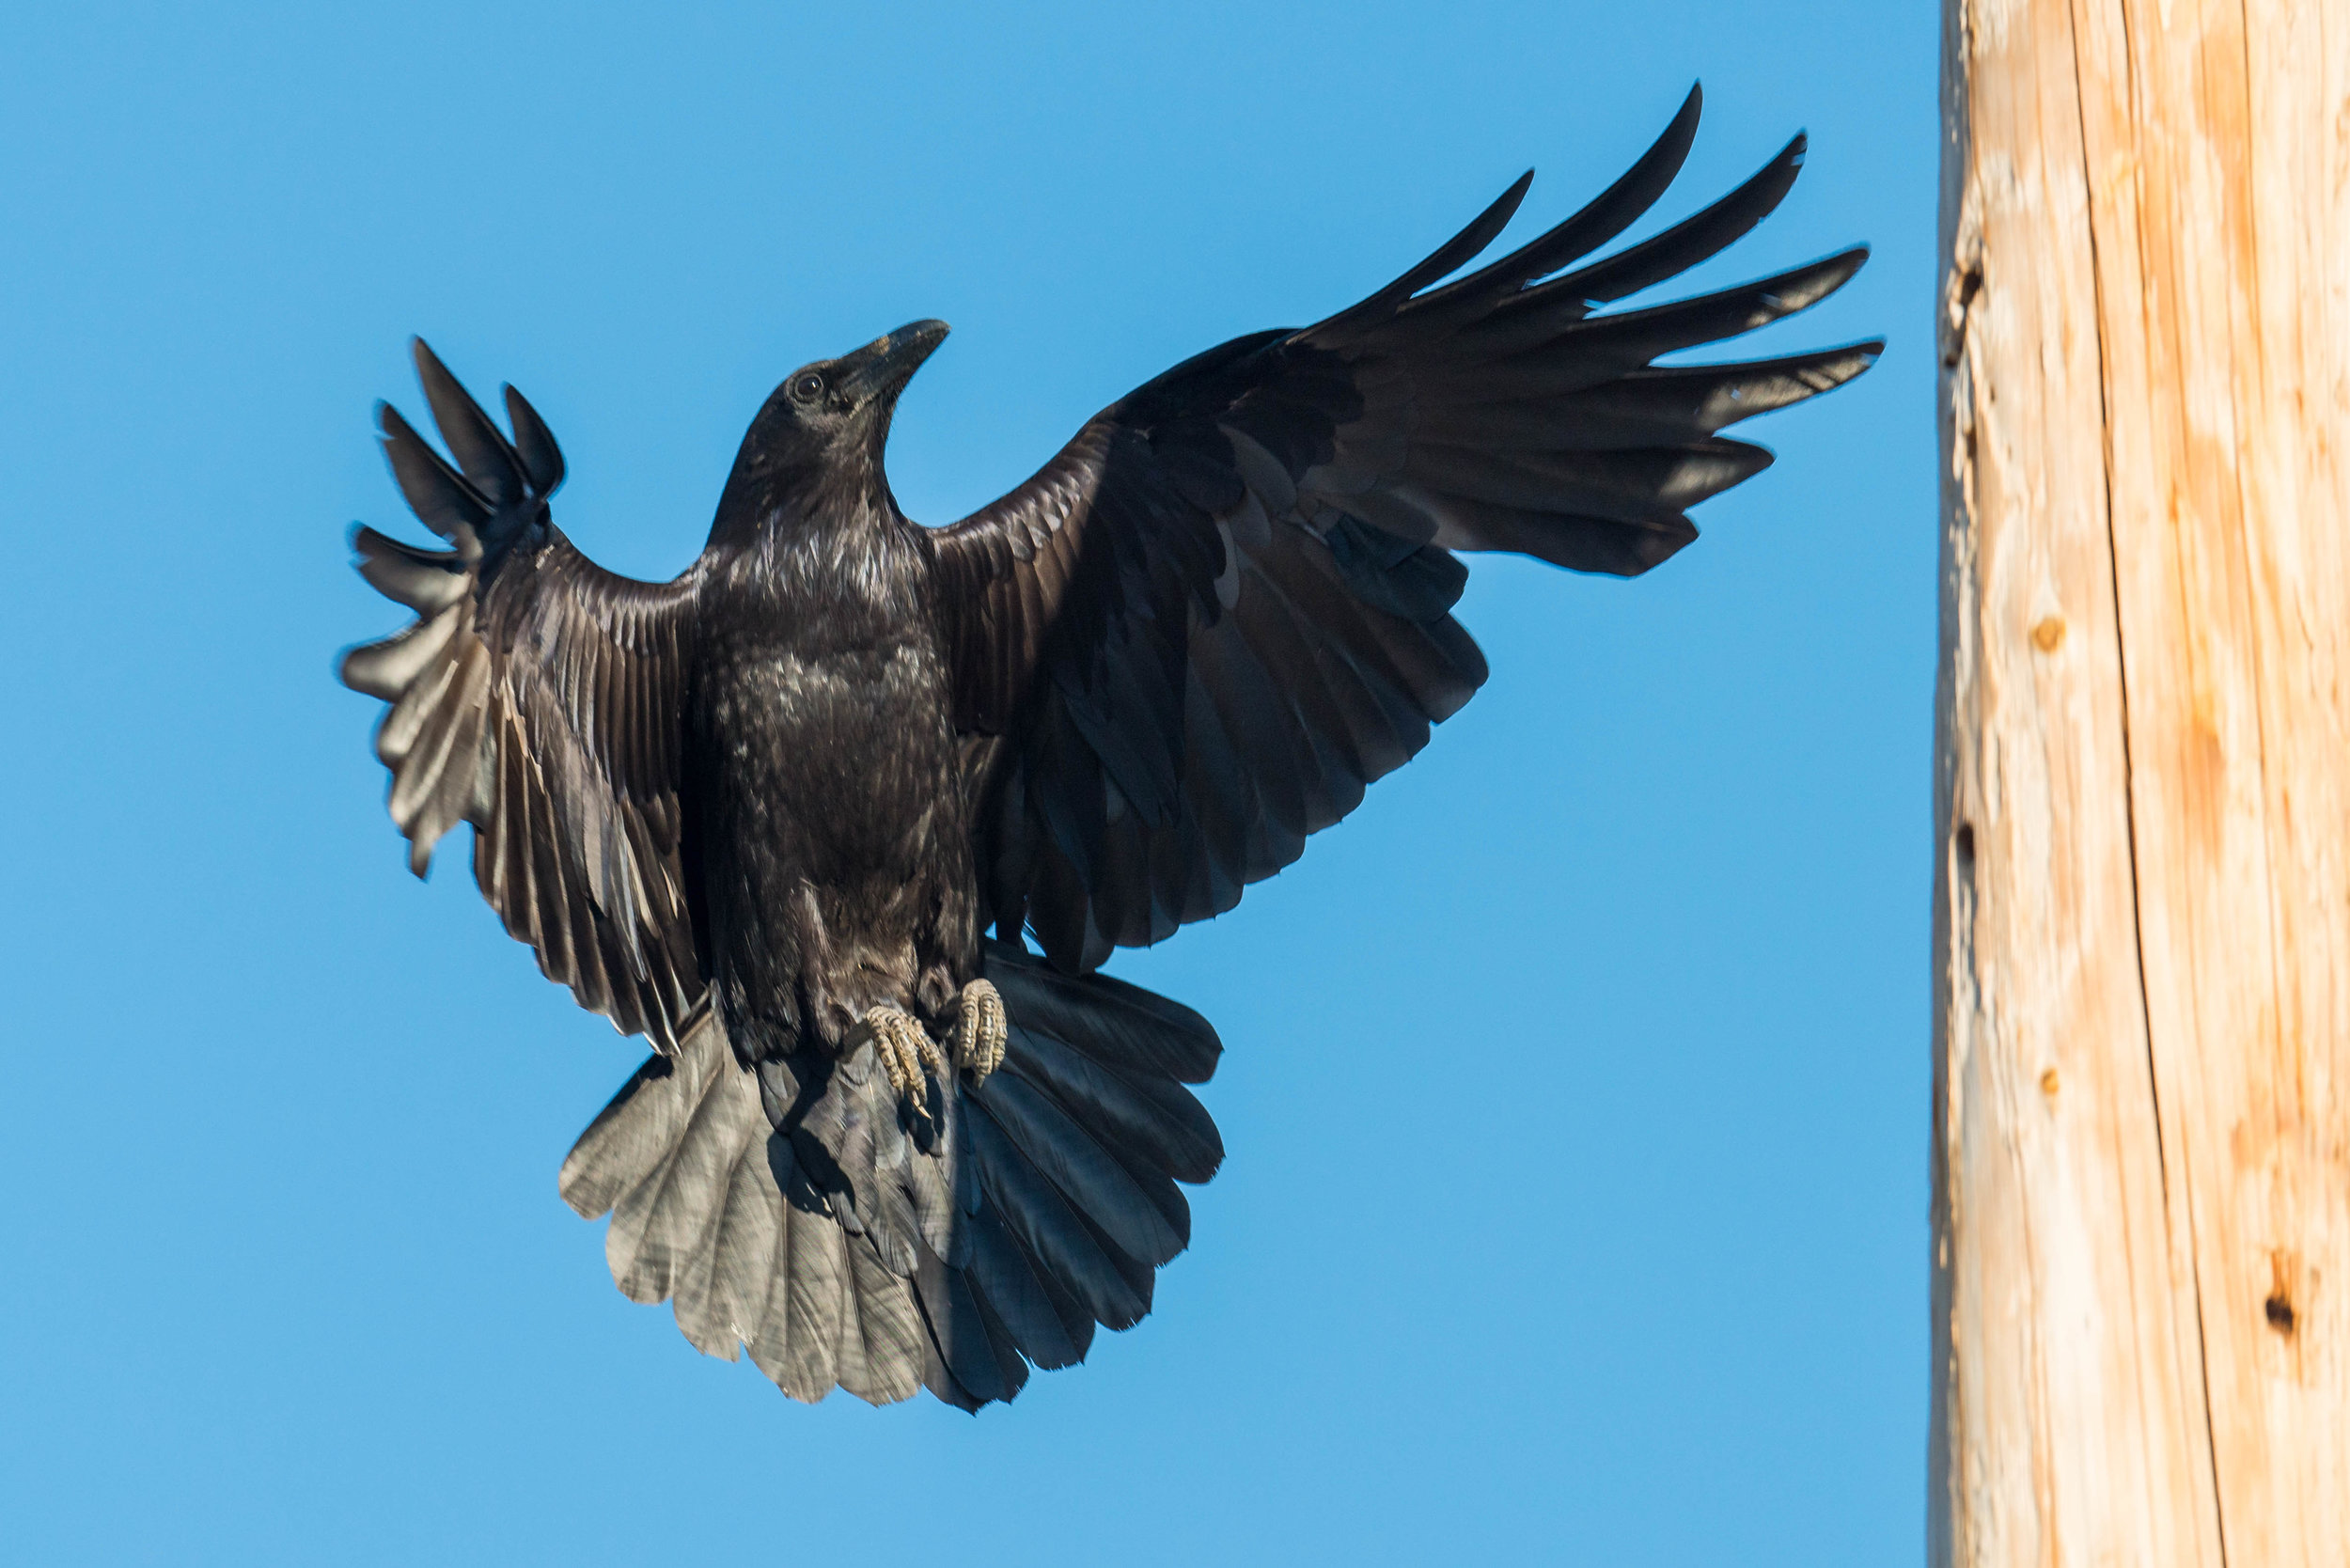 Common Raven (Corvus corax) - Silver Saddle Ranch, CAR (NV) Jun-2018